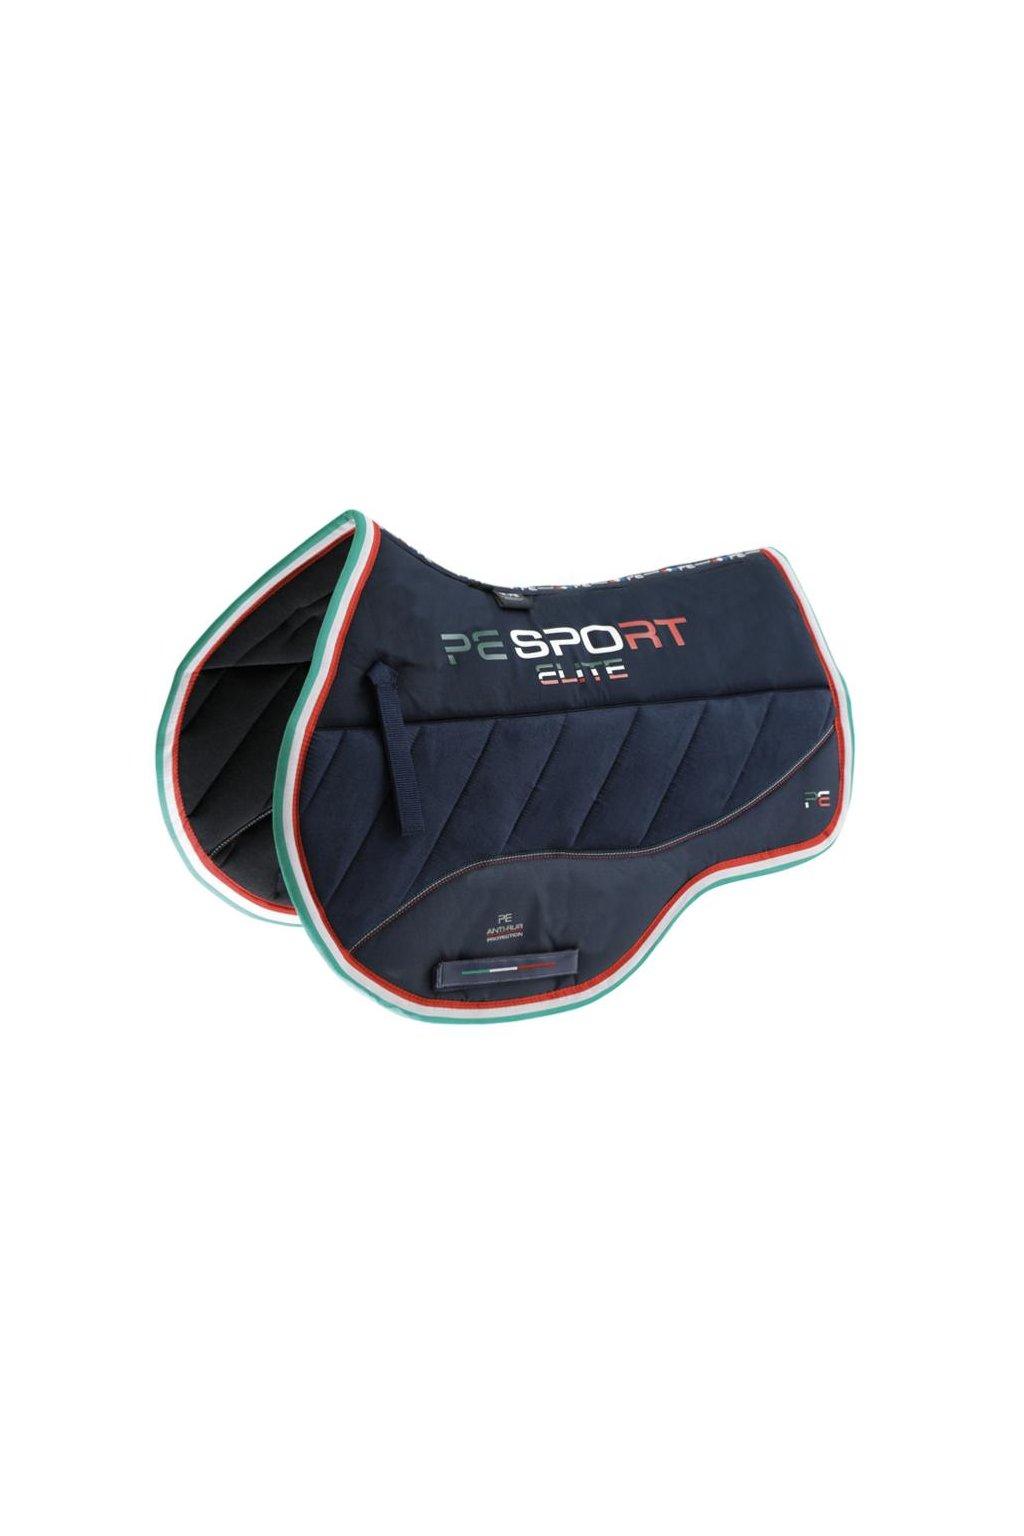 SS20 PE Sport Elite Italia Techno Suede GP Jump Square Navy Main Image 72 RG